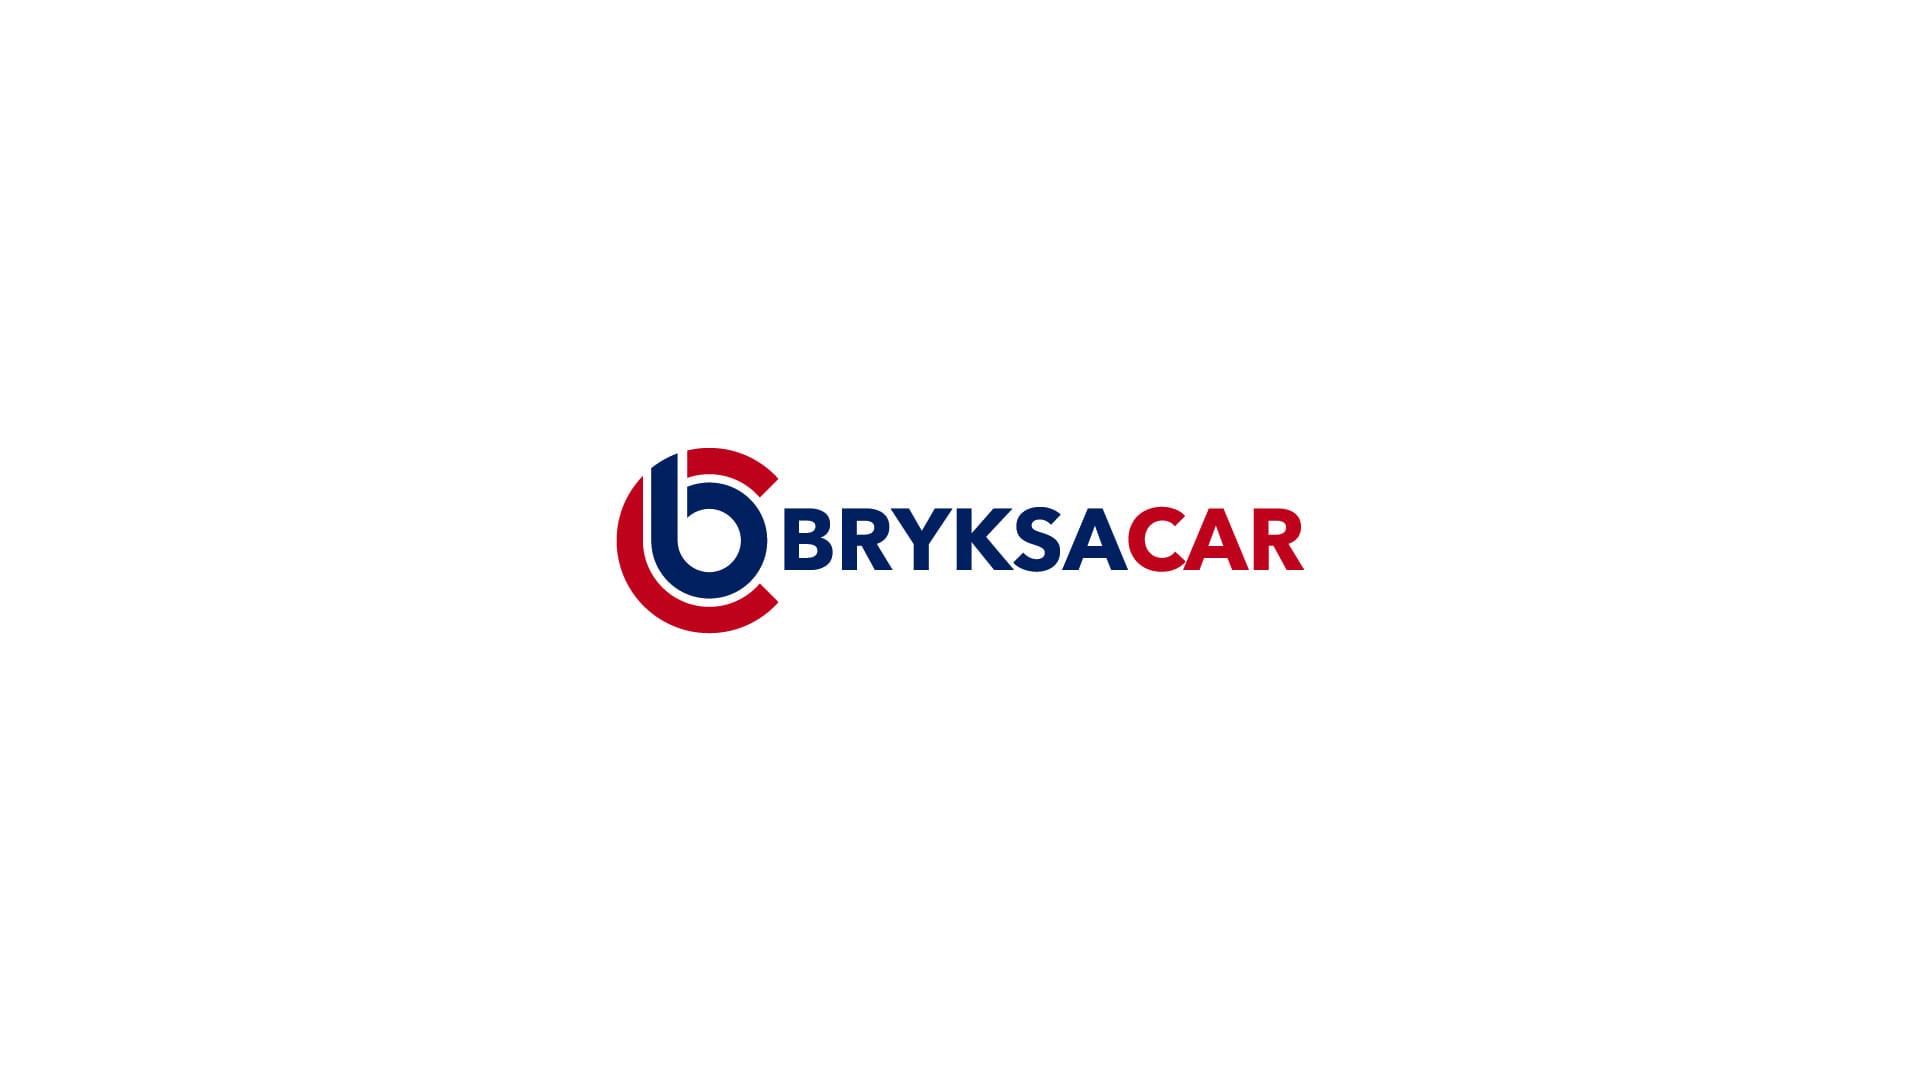 Bryksacar - Serwis Peugeot i Citroen